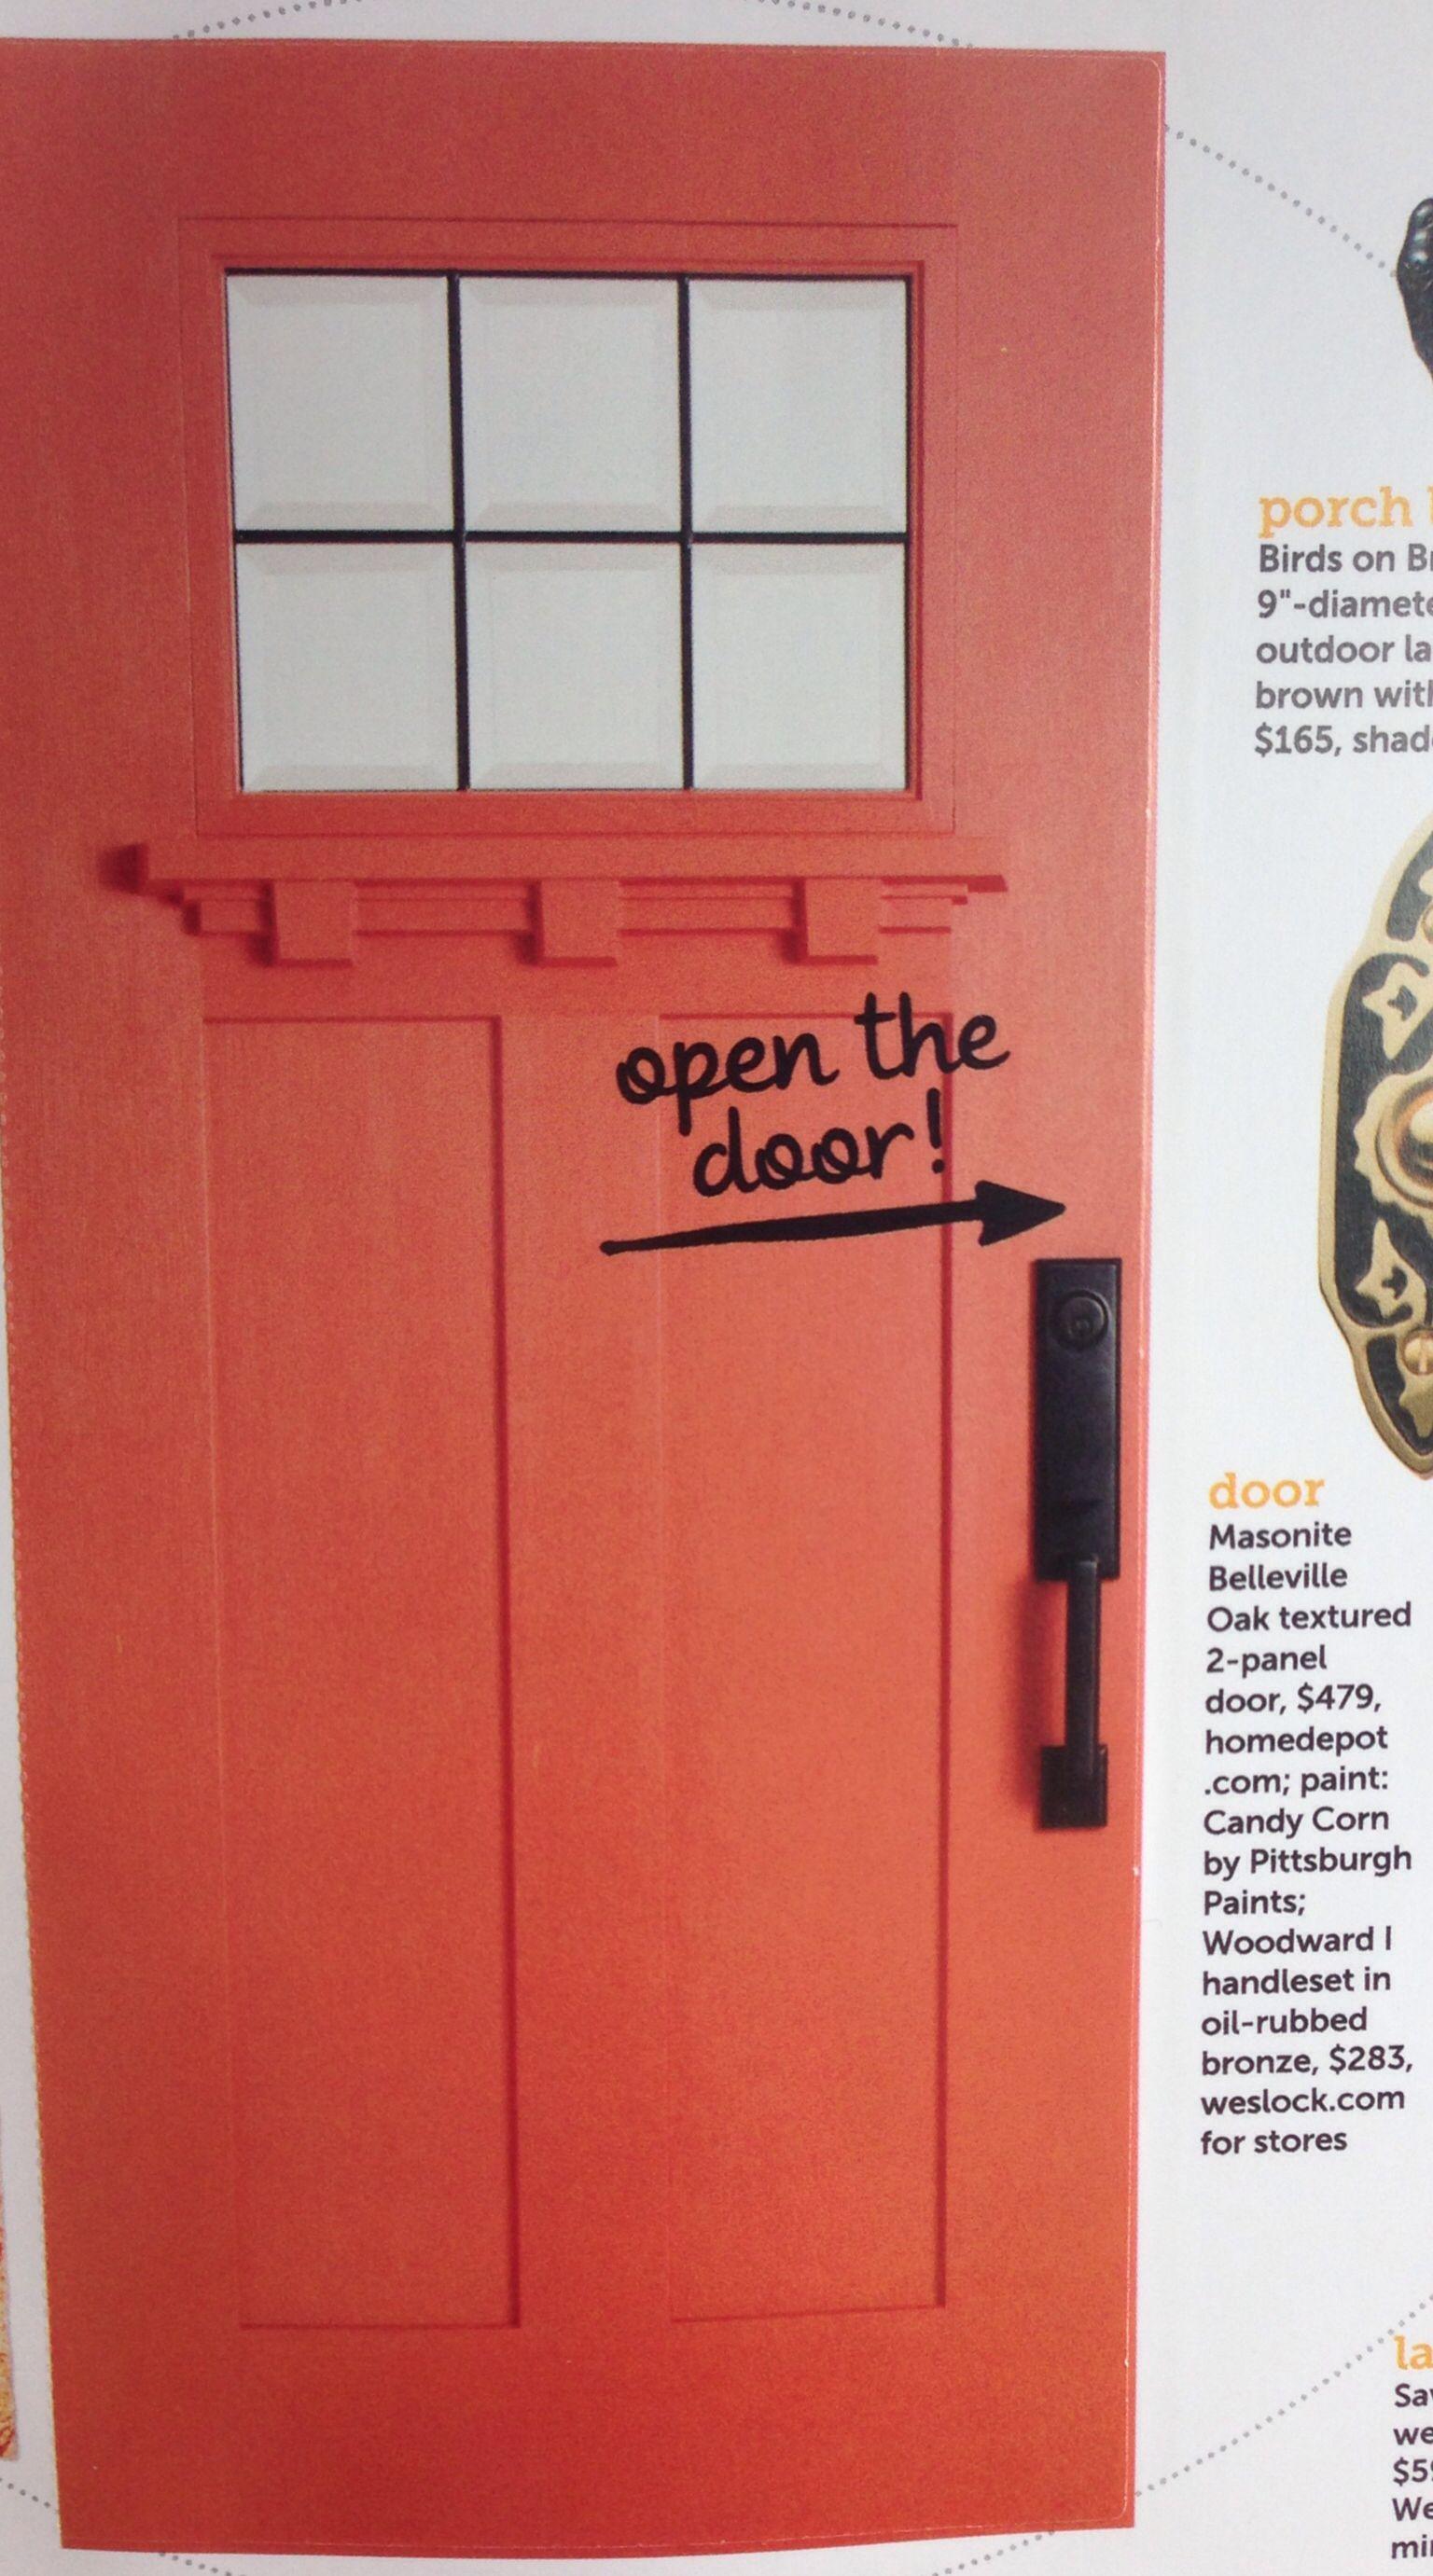 Pin By Jessica Wilson On 4 Da Home Masonite Interior Doors Interior Barn Doors Diy Interior Barn Doors